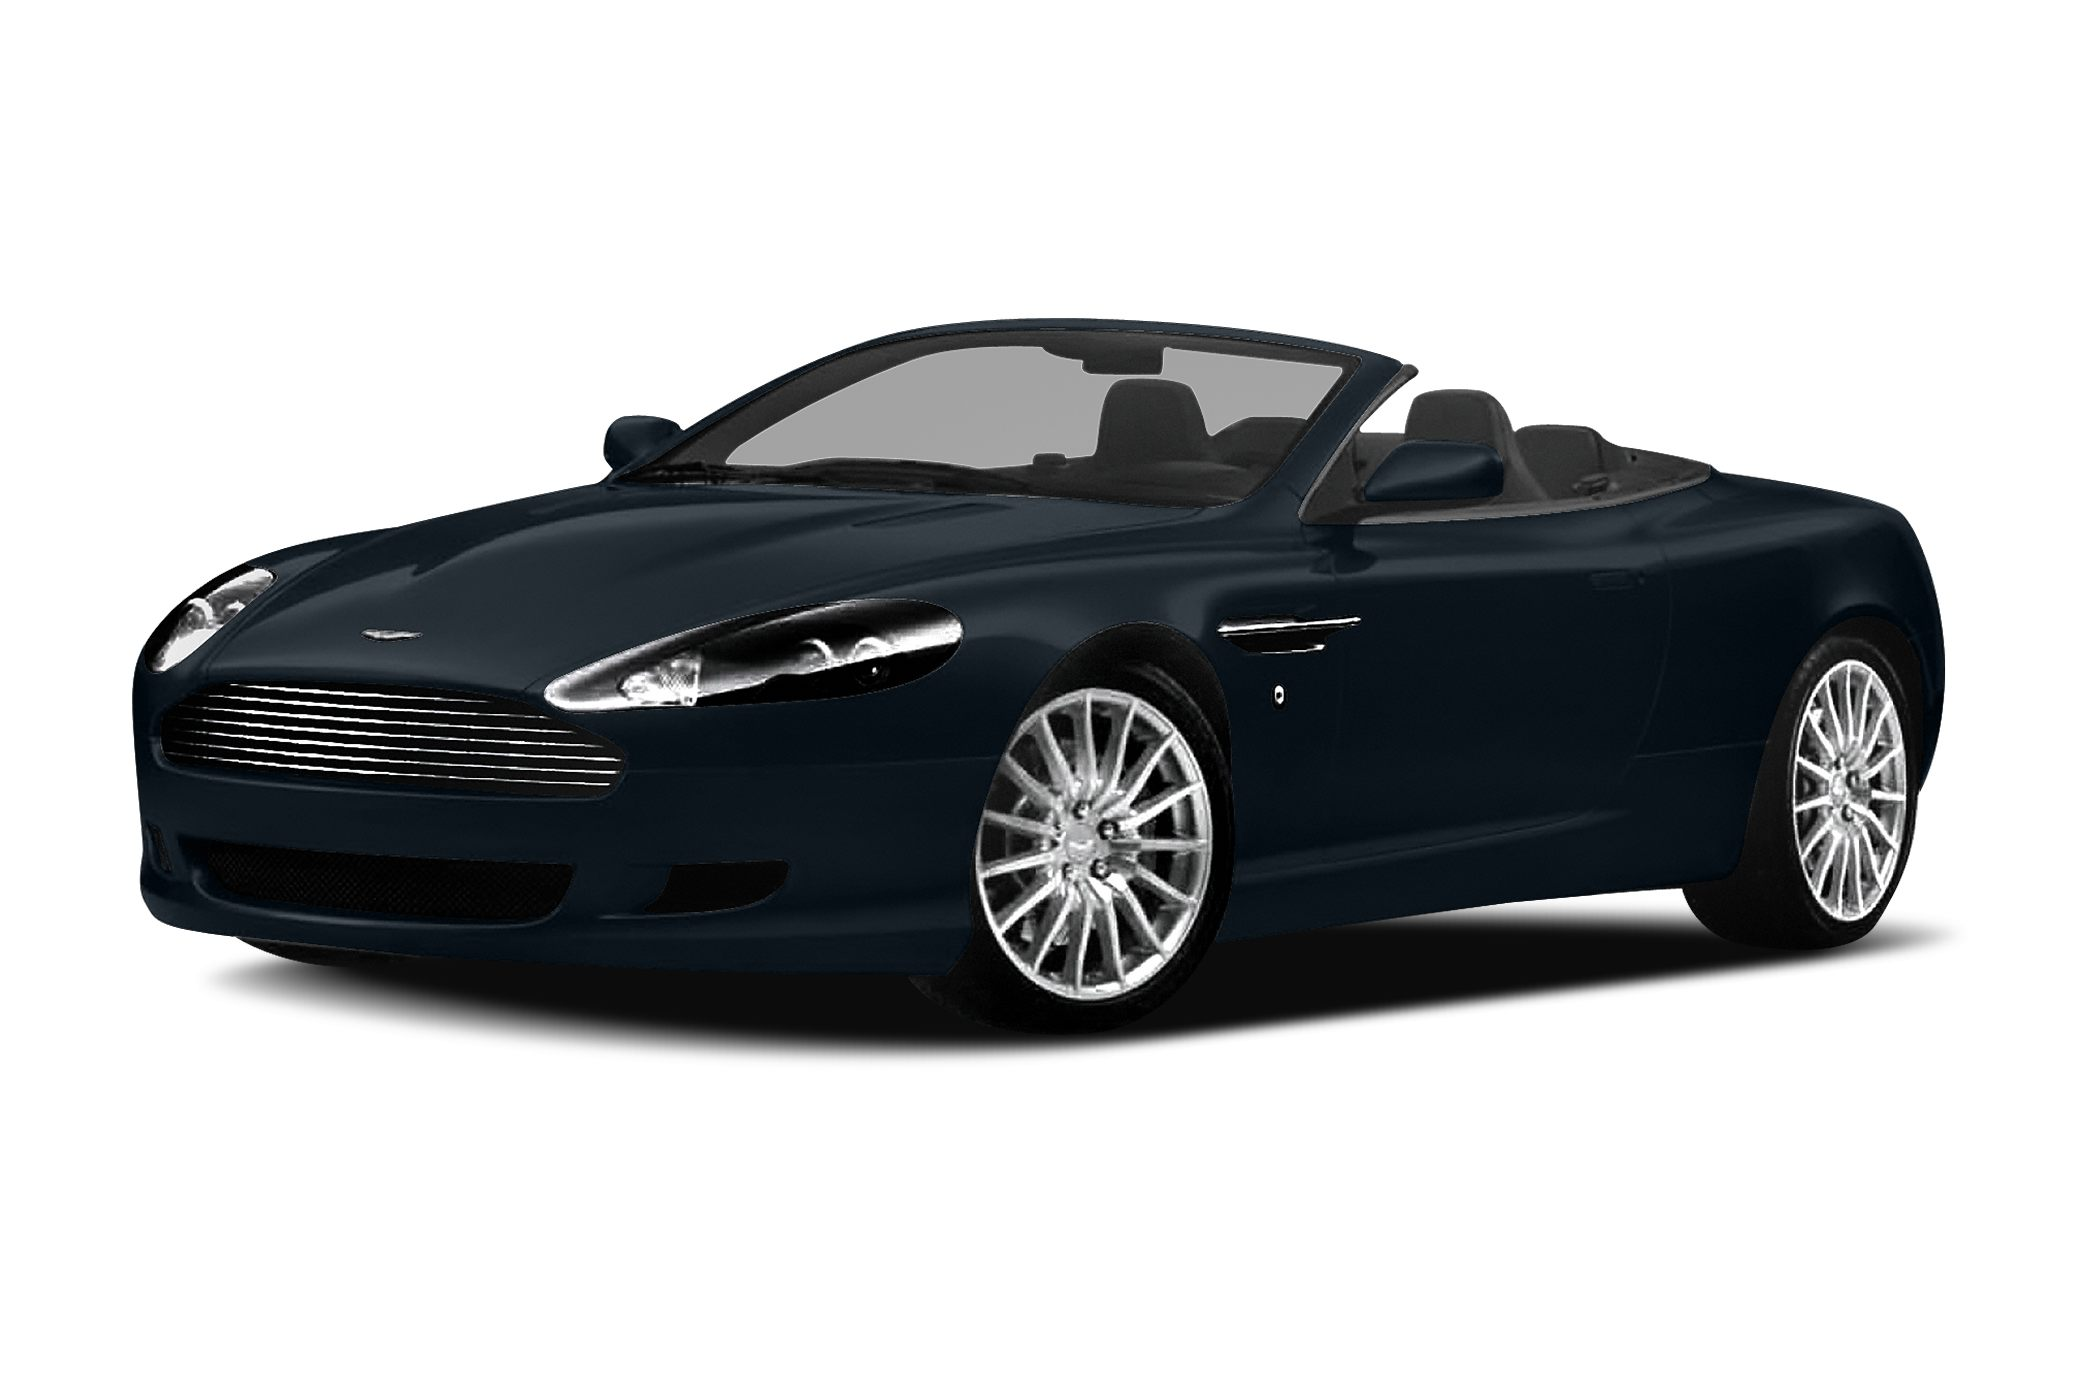 2007 Aston Martin Db9 Volante Convertible Specs And Prices